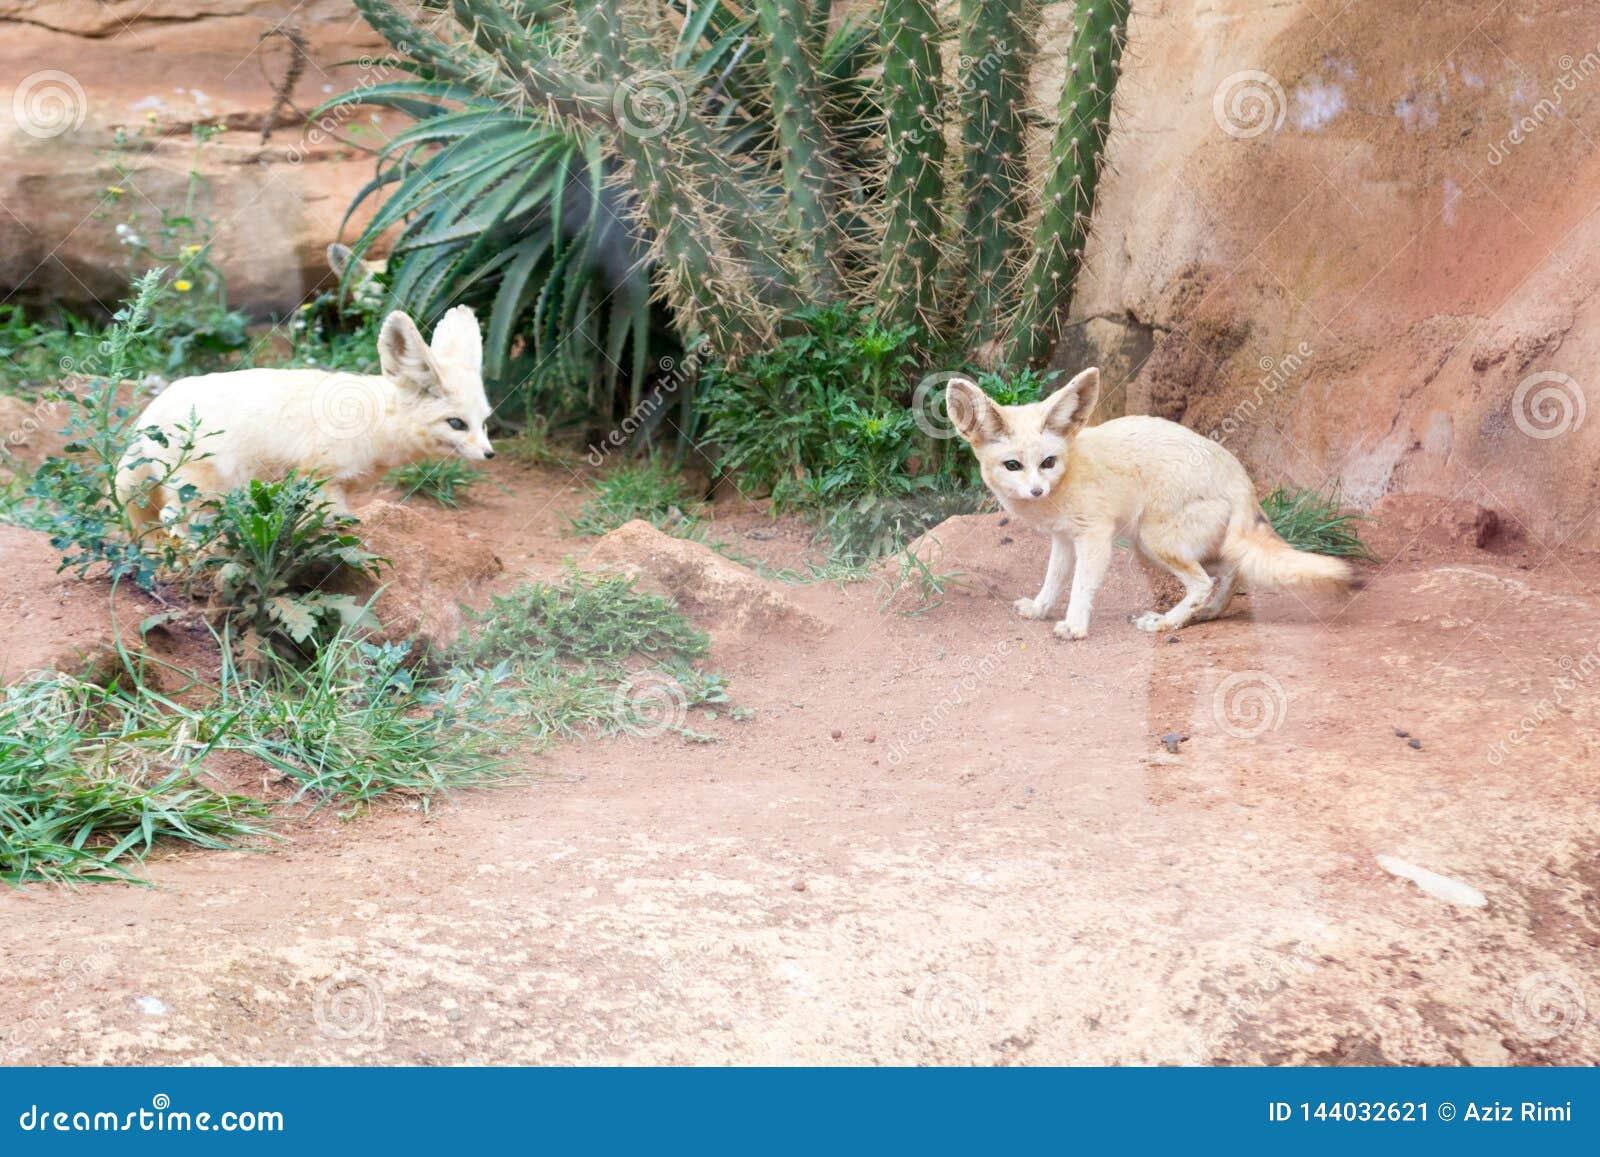 Fennec fox stock image  Image of mammals, female, living - 144032621